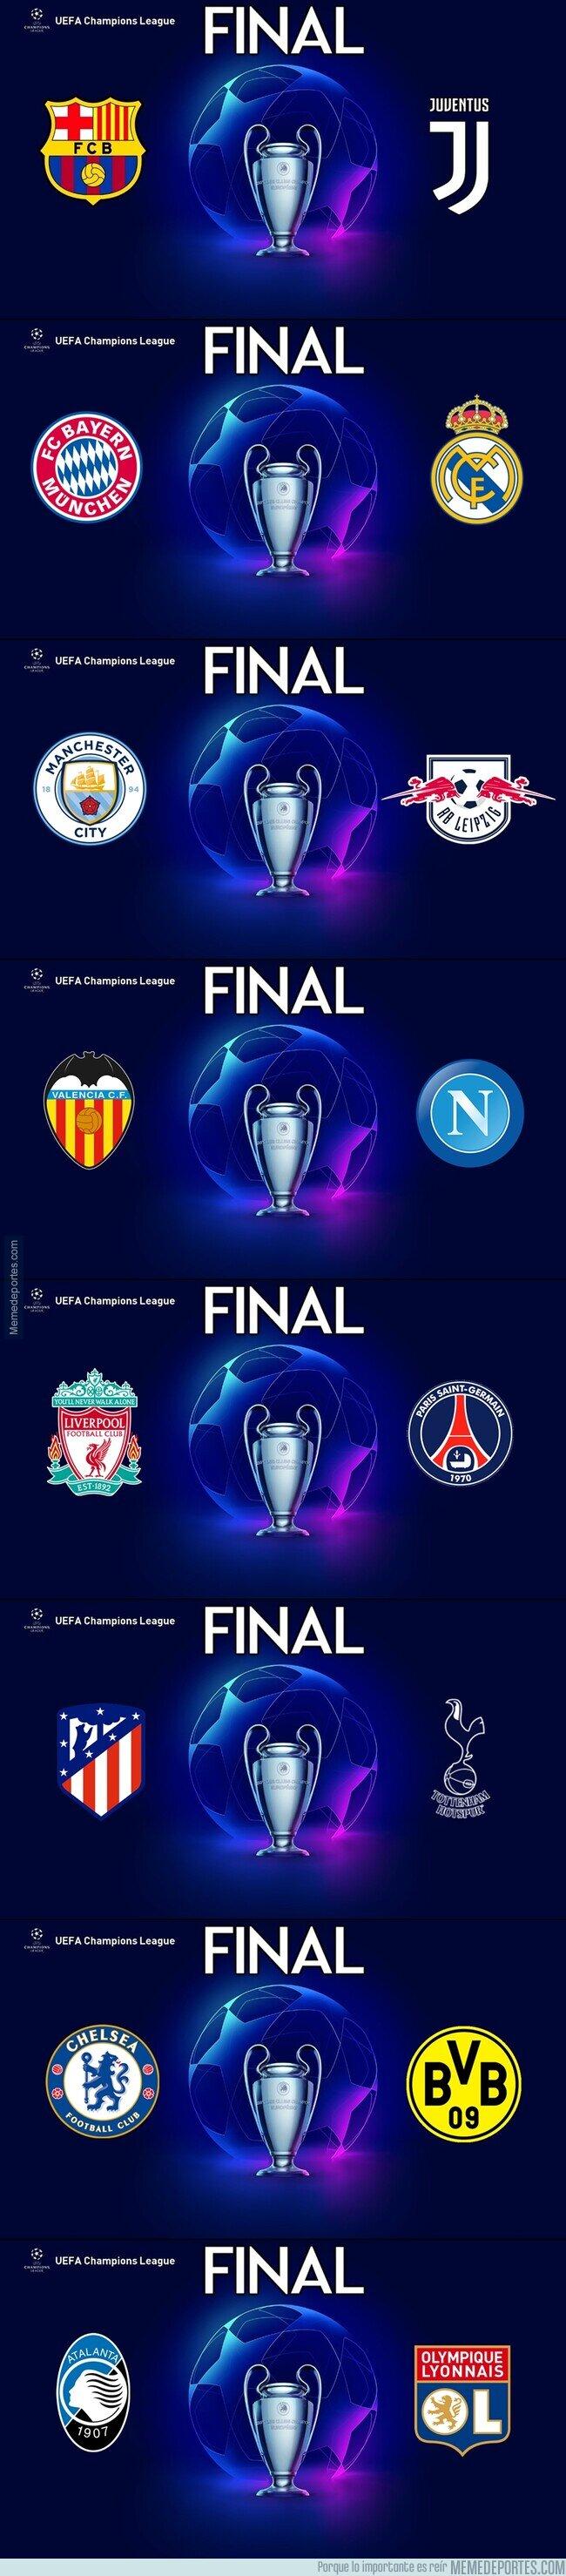 1105528 - ¿Cuál te hubiese gustado que fuese la final de Champions?